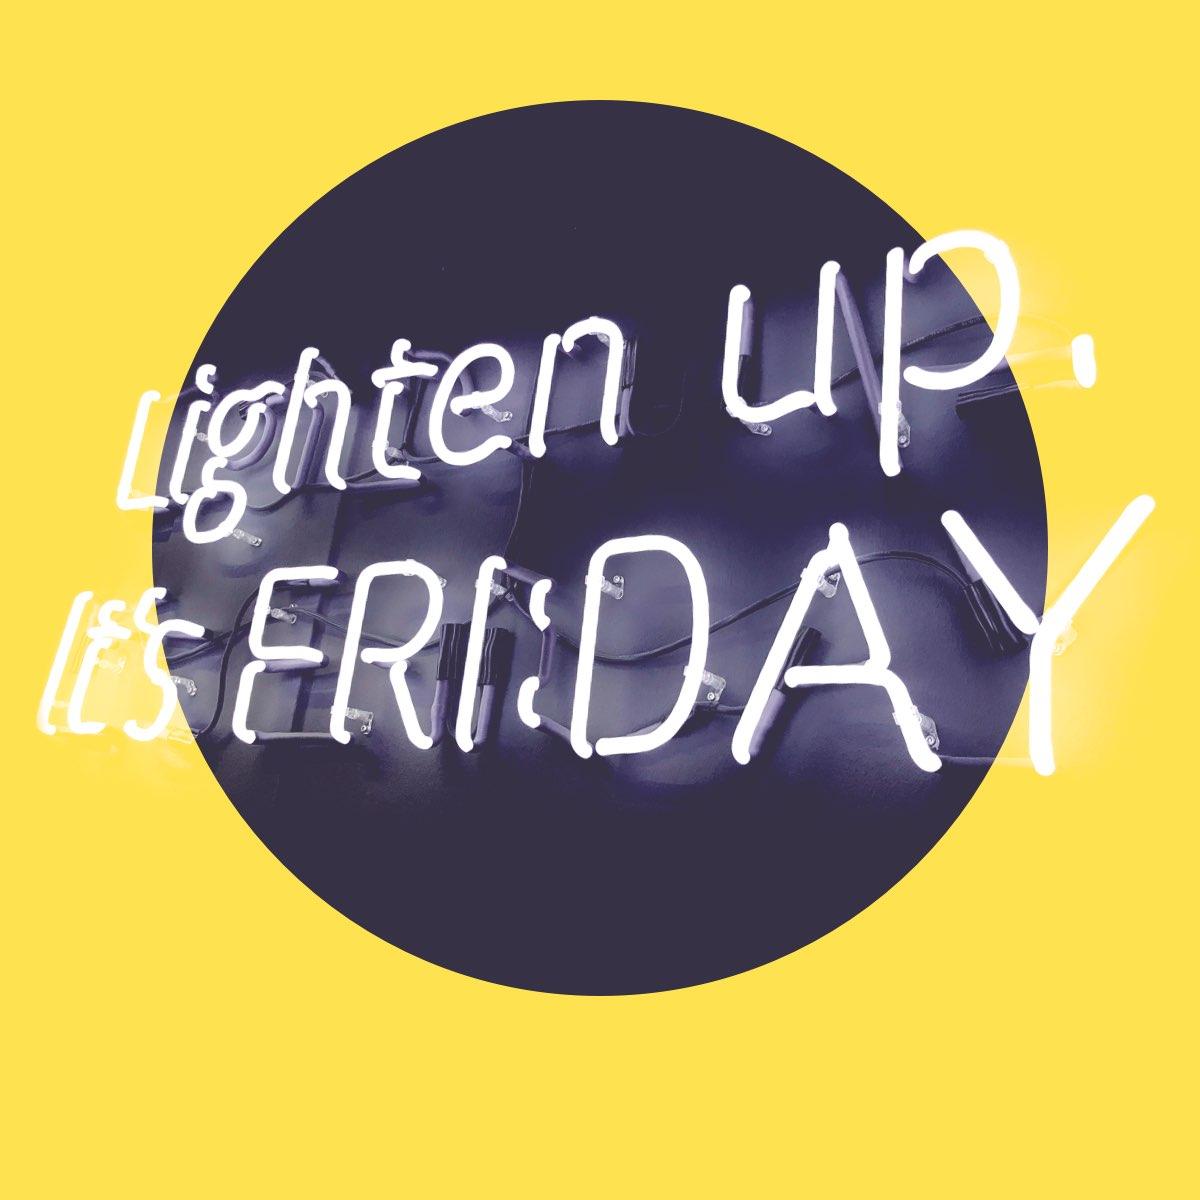 Lighten up it´s friday